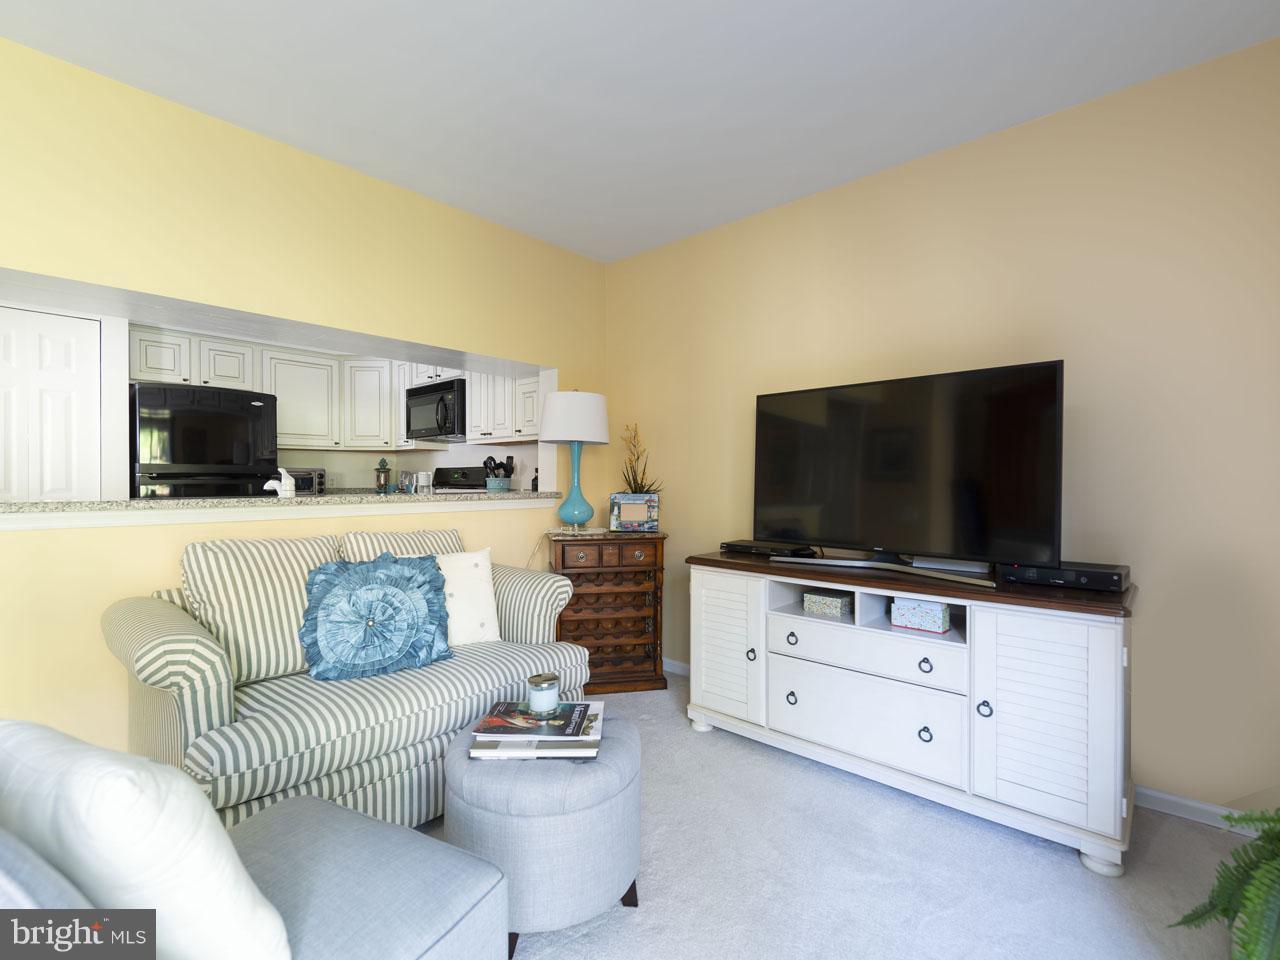 1002640508-300537943124-2021-07-22-05-00-37     Pinecrest   Alexandria Delaware Real Estate For Sale   MLS# 1002640508  - Best of Northern Virginia